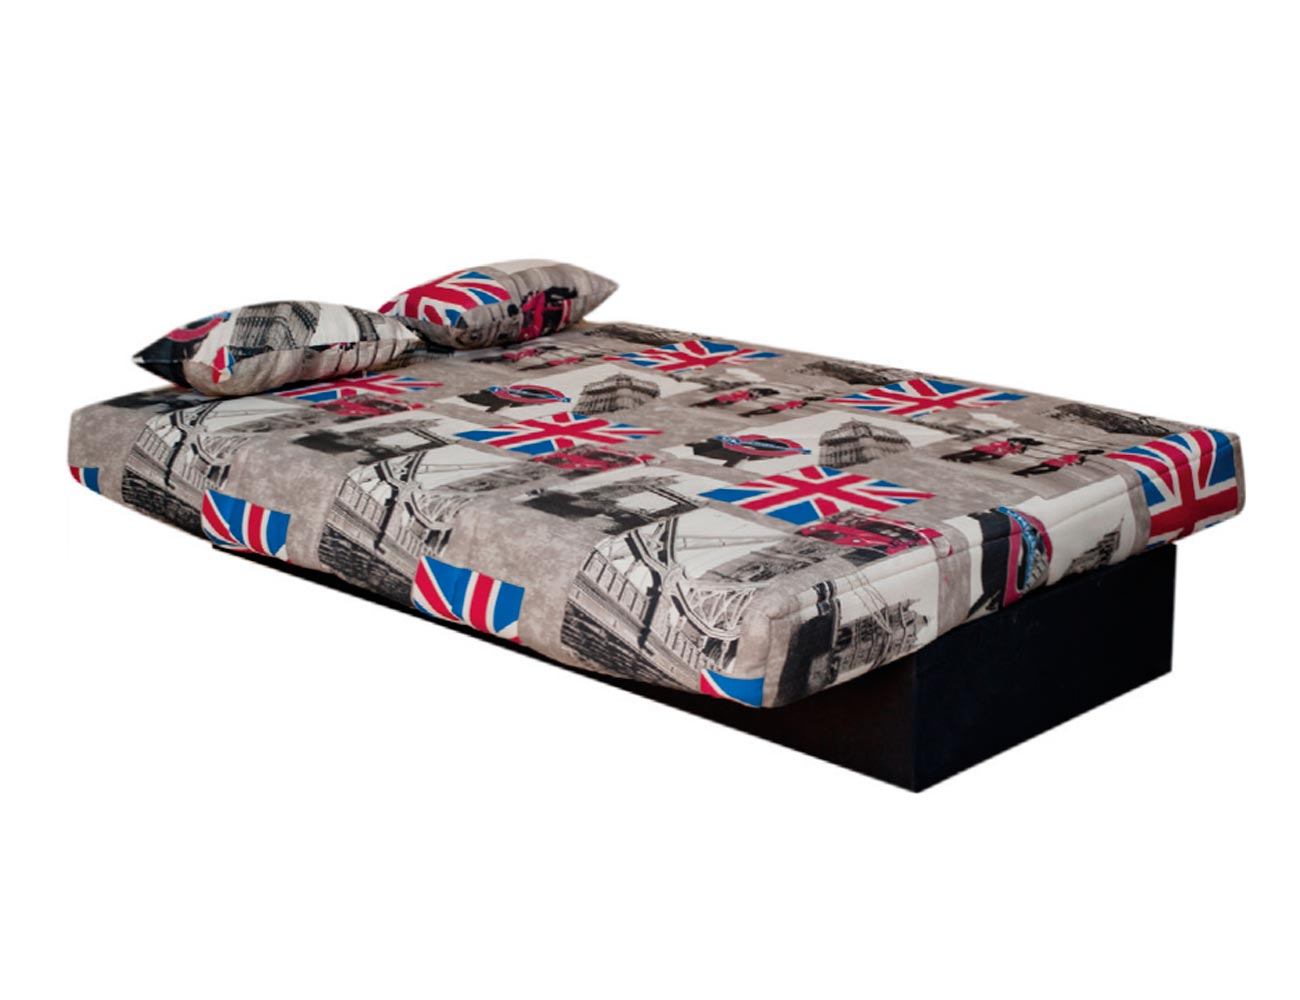 Sofa cama automatico arcon 2